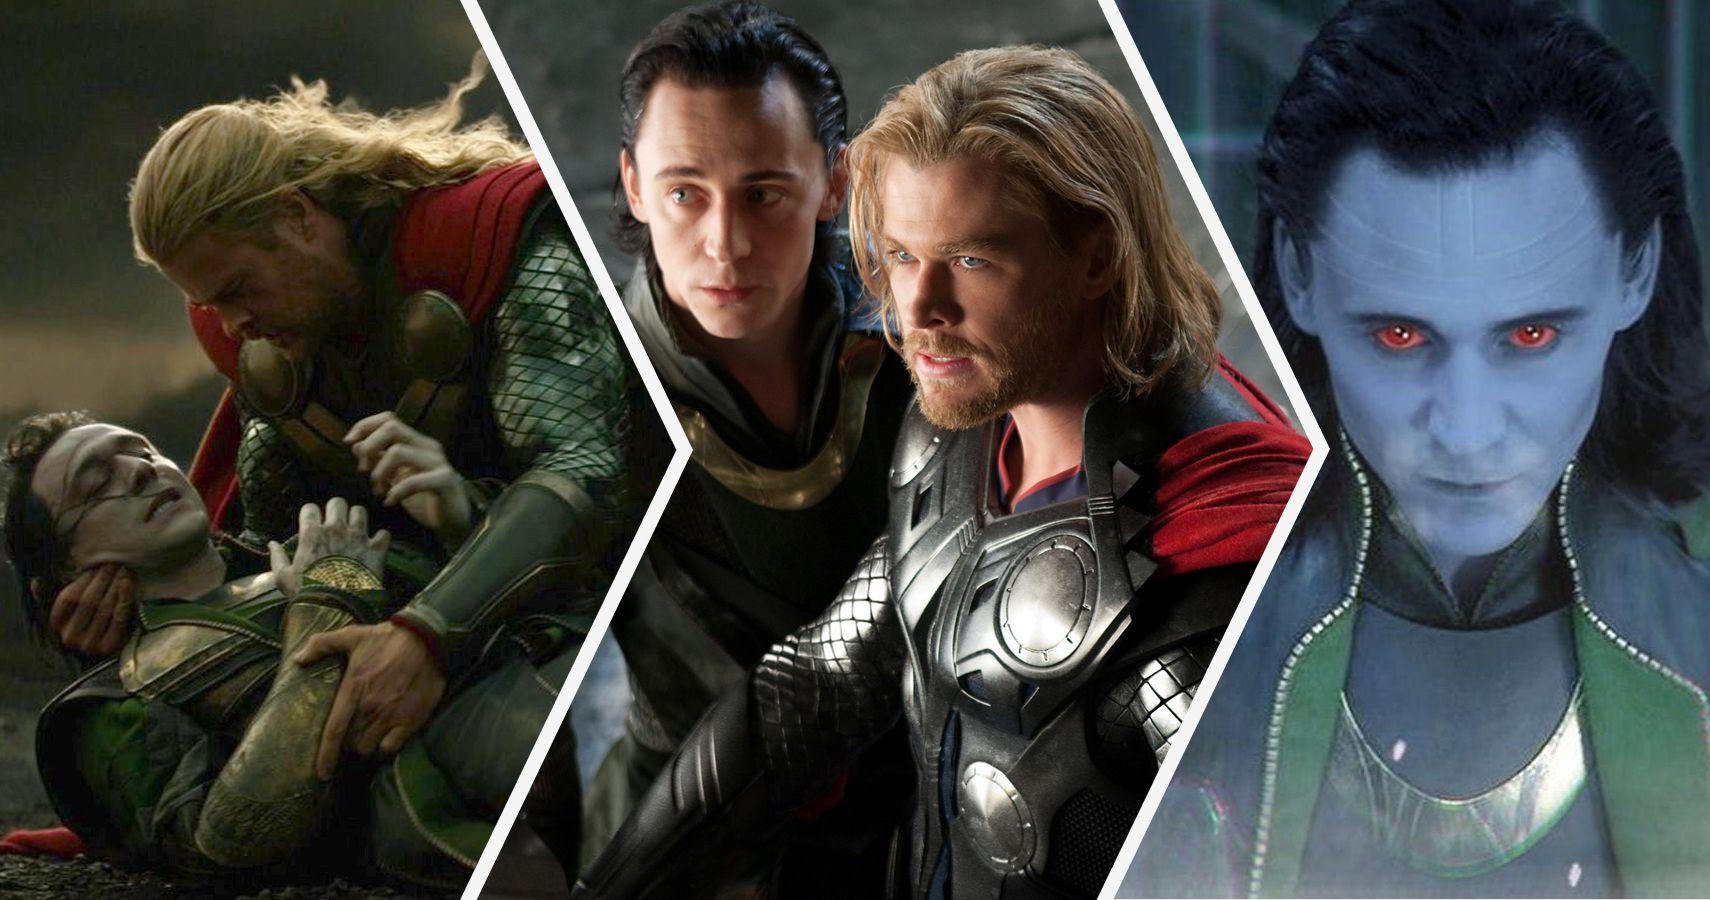 20 Things About Thor And Loki's Relationship That Make No Sense